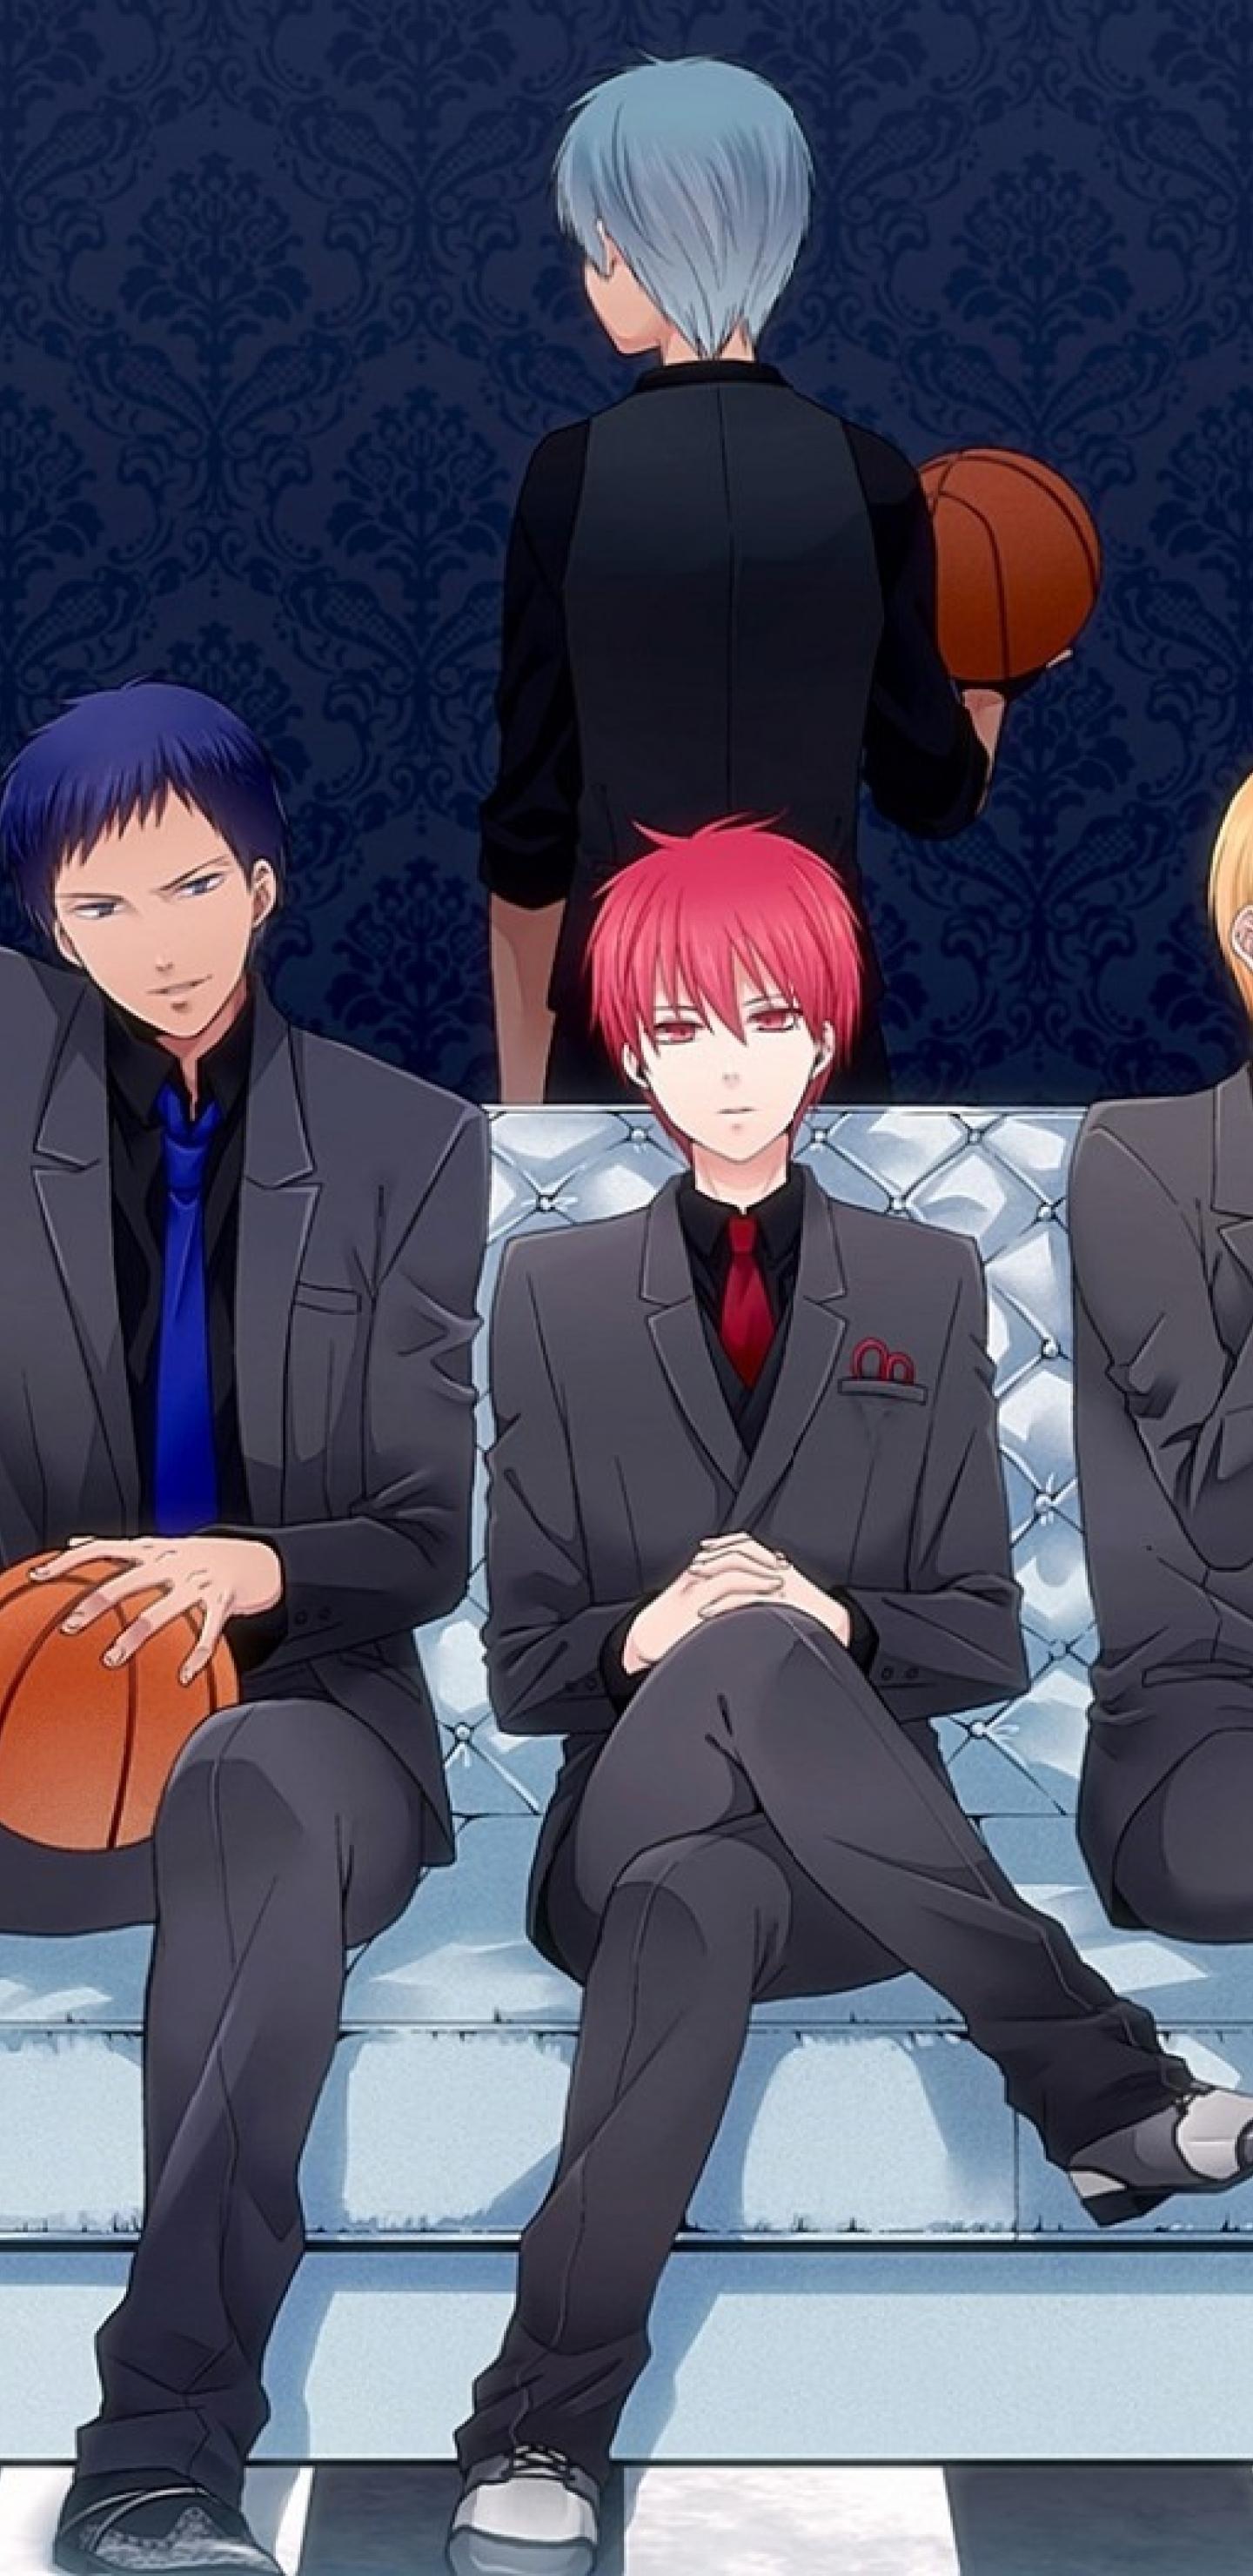 1440x2960 Kuroko No Basket Basketball Kuroko Akashi Seijuurou Samsung Galaxy Note 9 8 S9 S8 S8 Qhd Wallpaper Hd Anime 4k Wallpapers Images Photos And Background